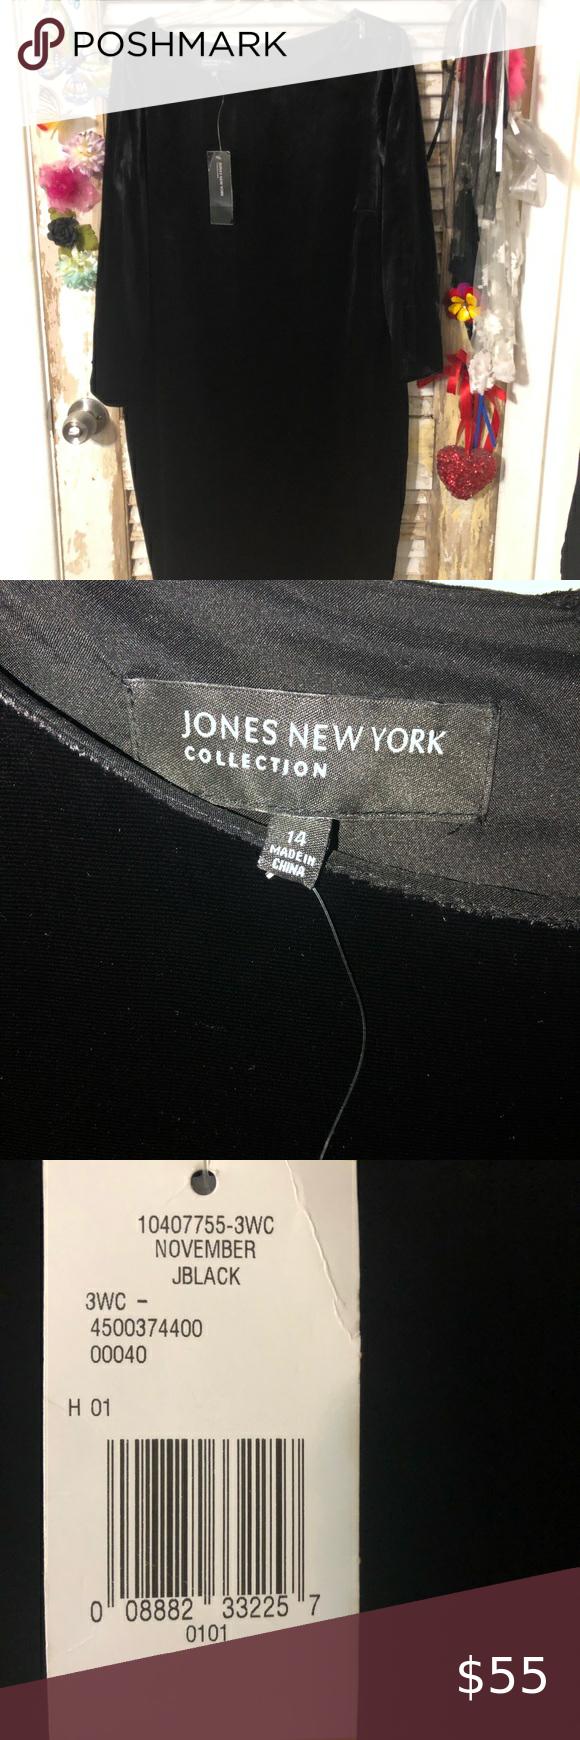 Jones New York Collection Black Dress Sz 14 Jones New York Black Dress Dress Zipper [ 1740 x 580 Pixel ]